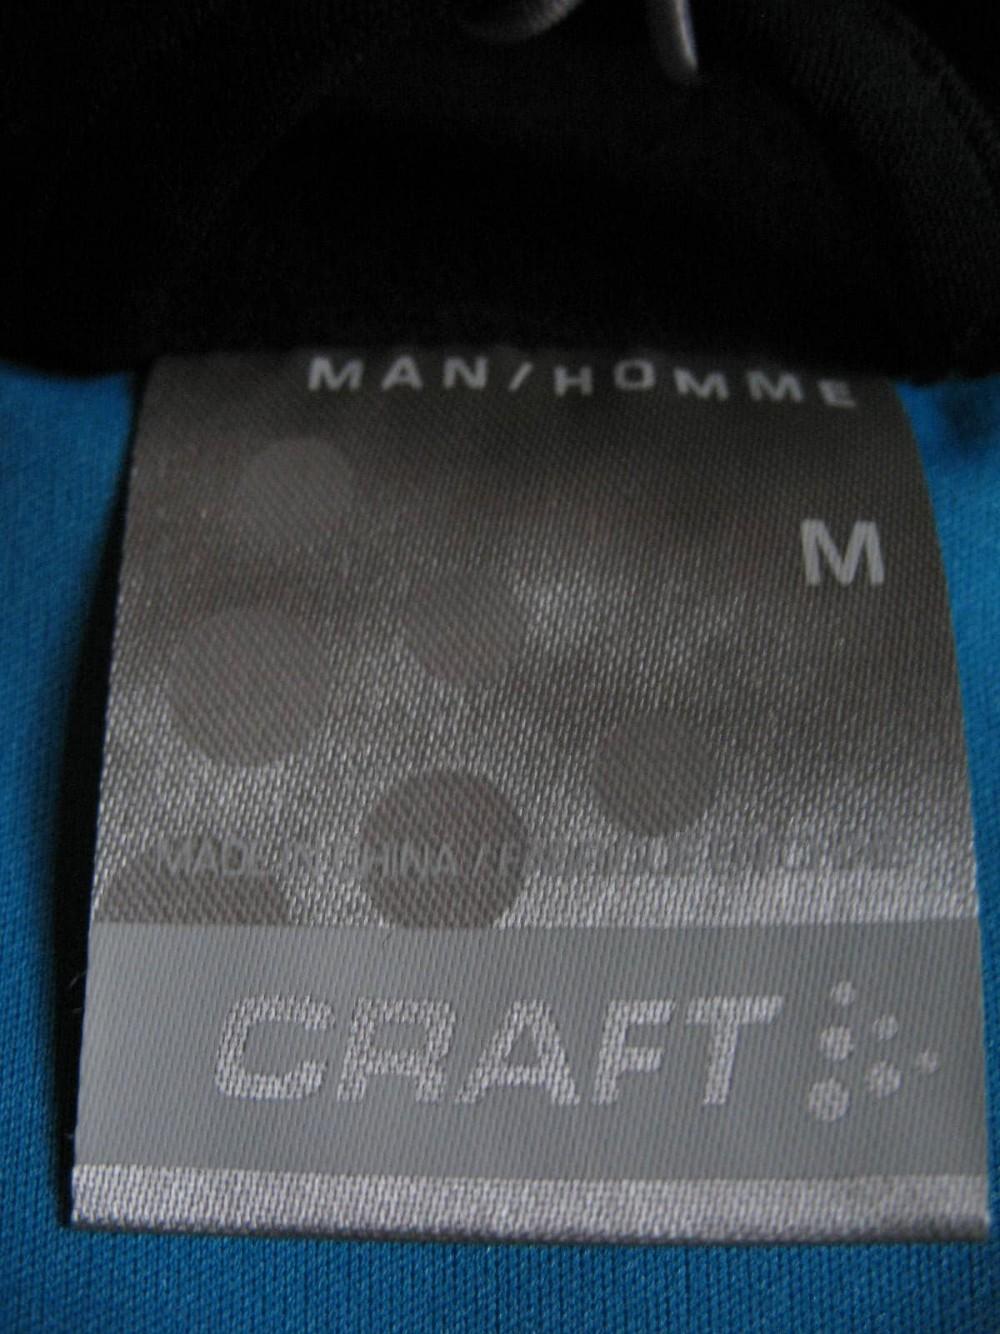 Куртка CRAFT pxc light softshell black jacket (размер M) - 6